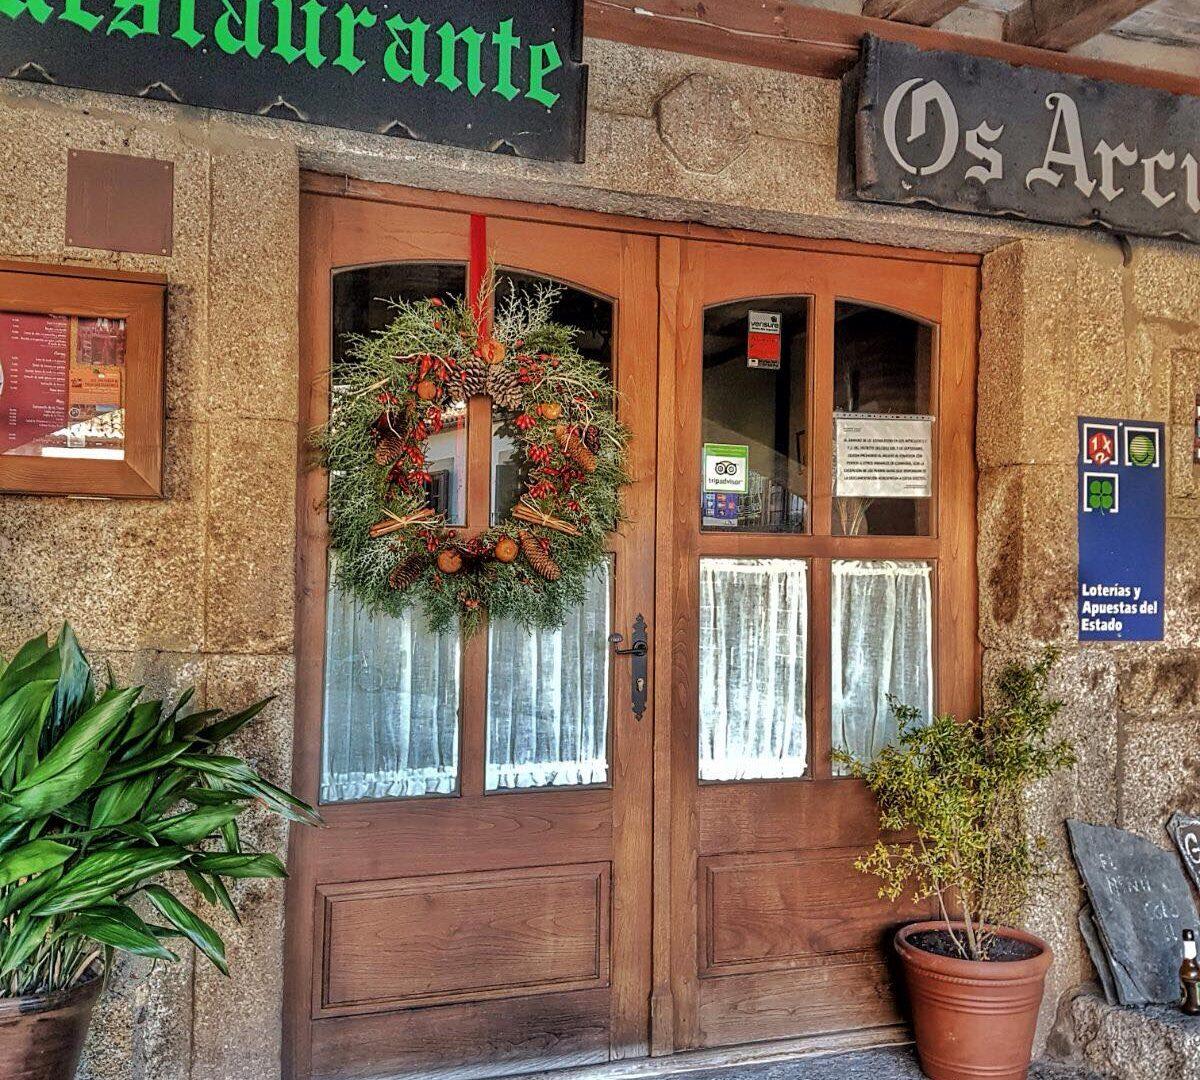 Restaurante Os Arcus